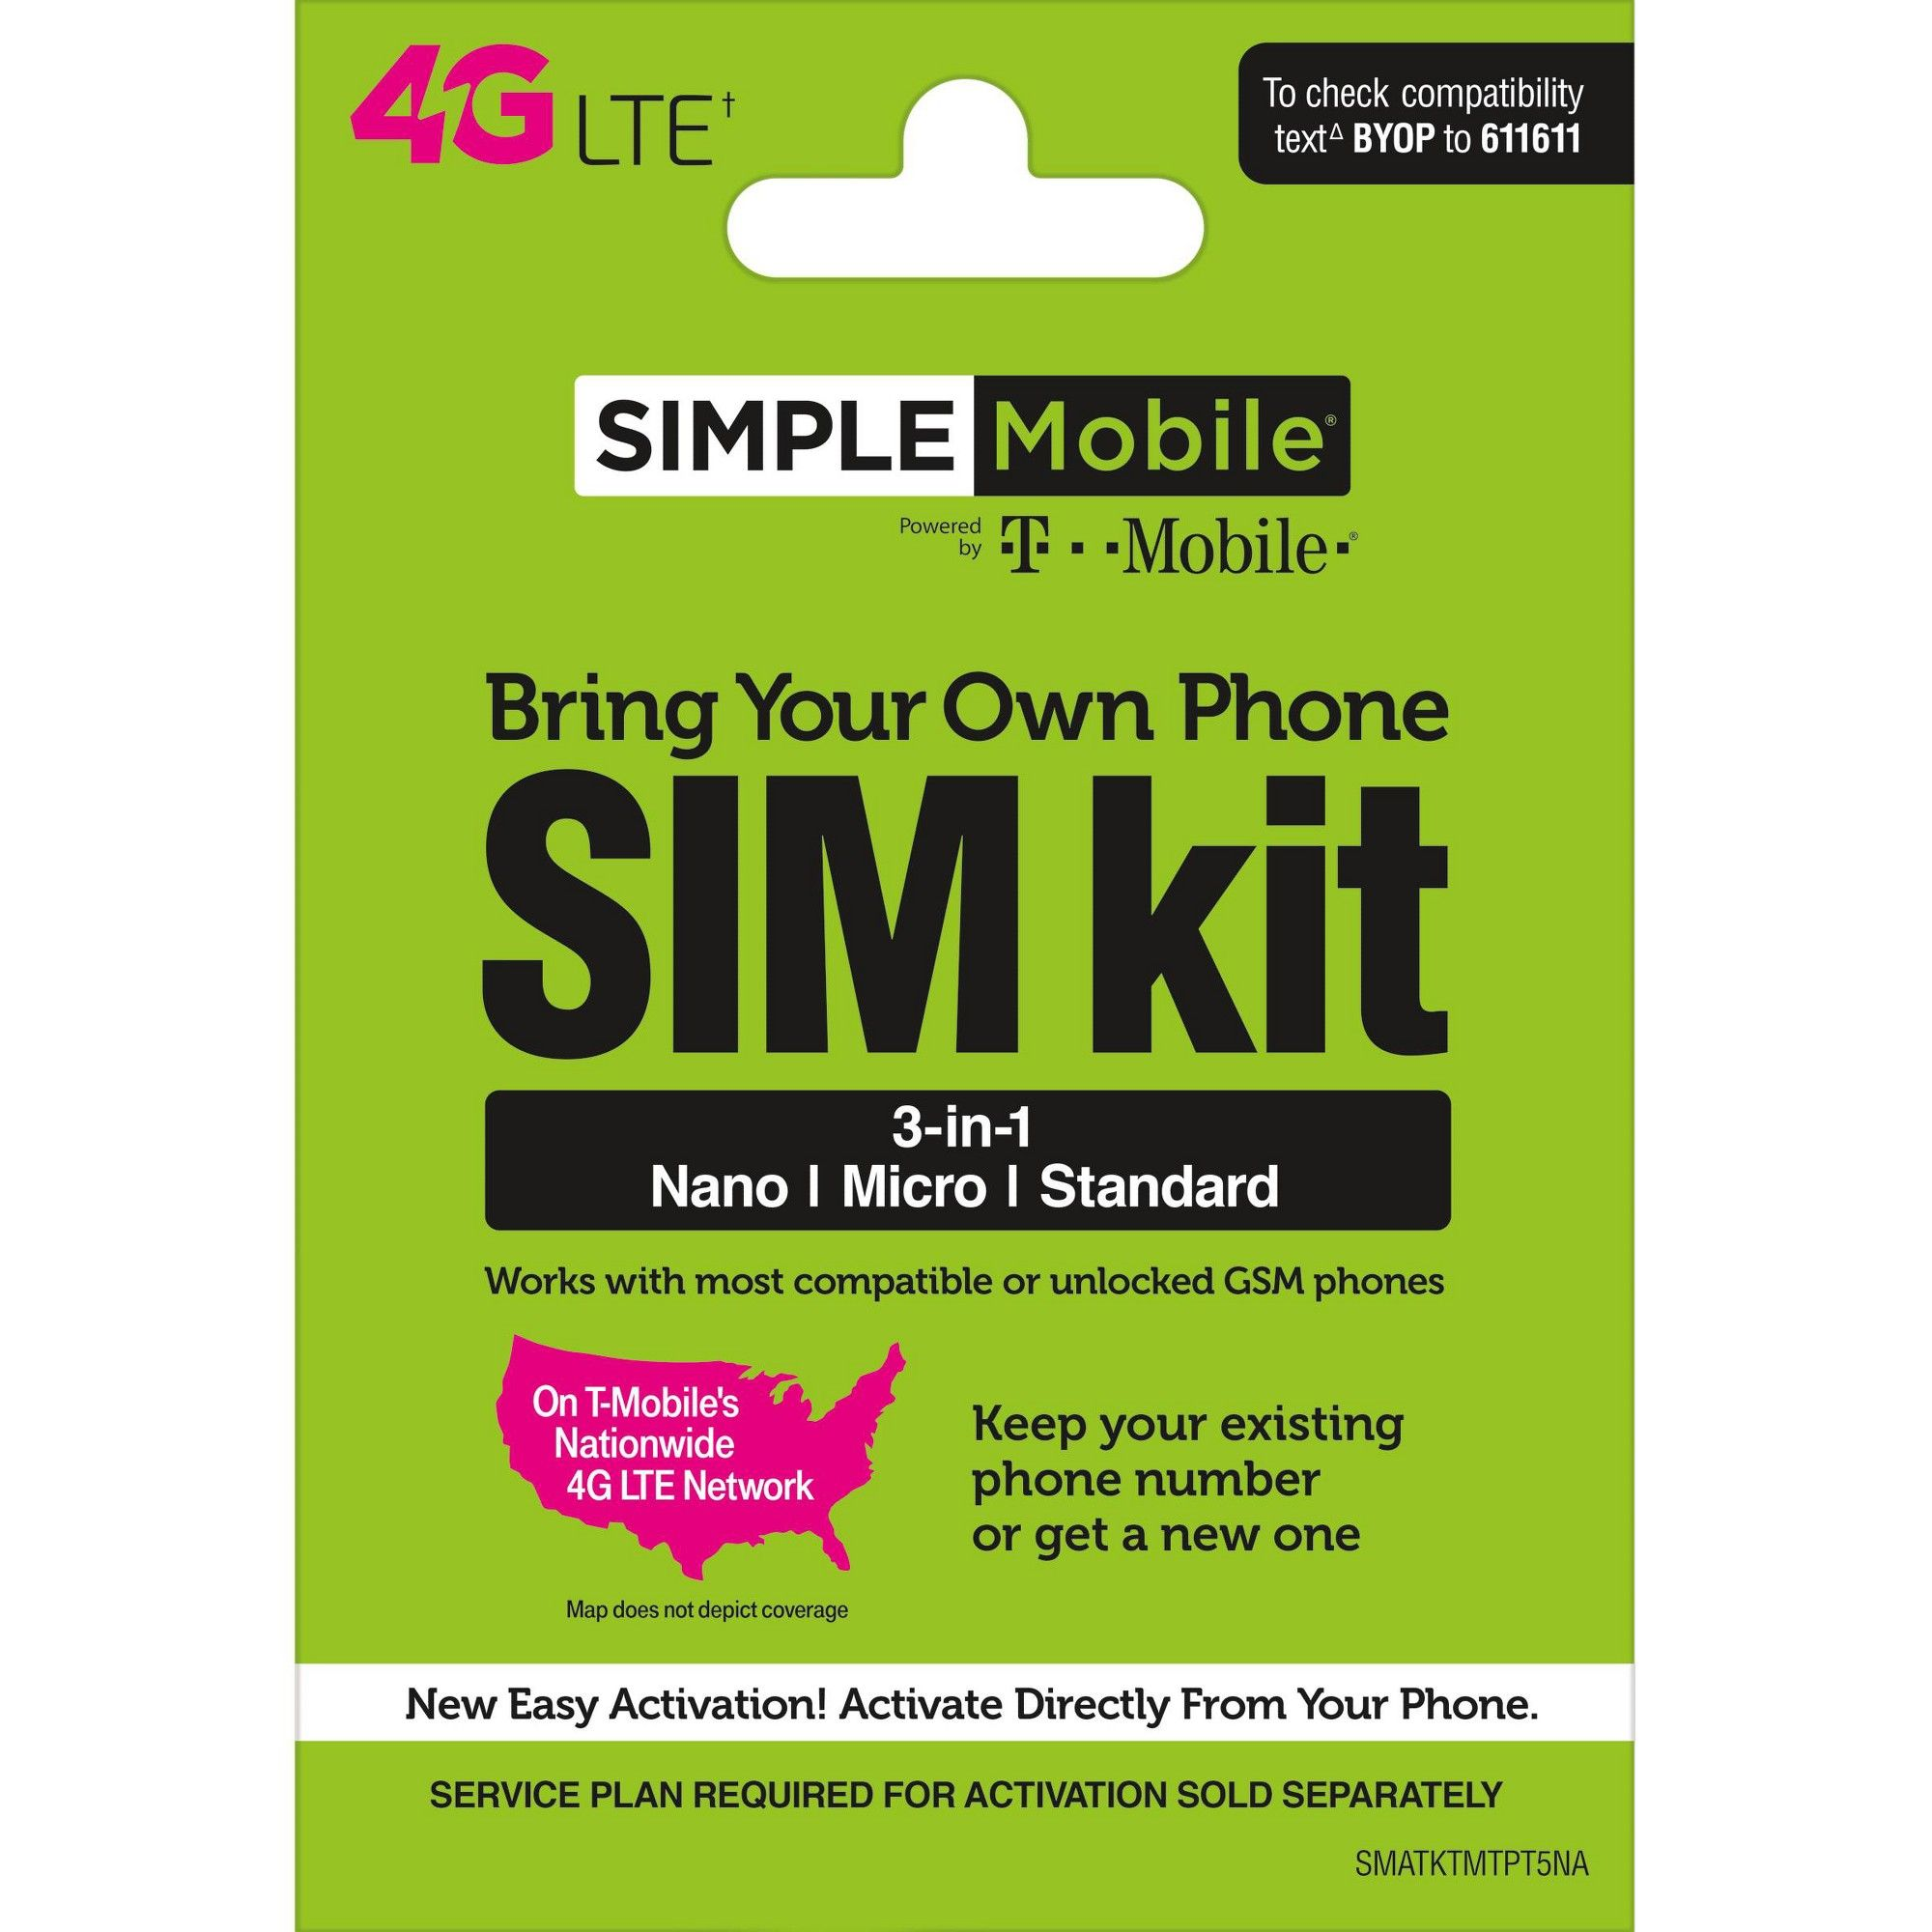 Simple Mobile Sim Kit In 2021 Simple Mobile Boost Mobile Prepaid Phones